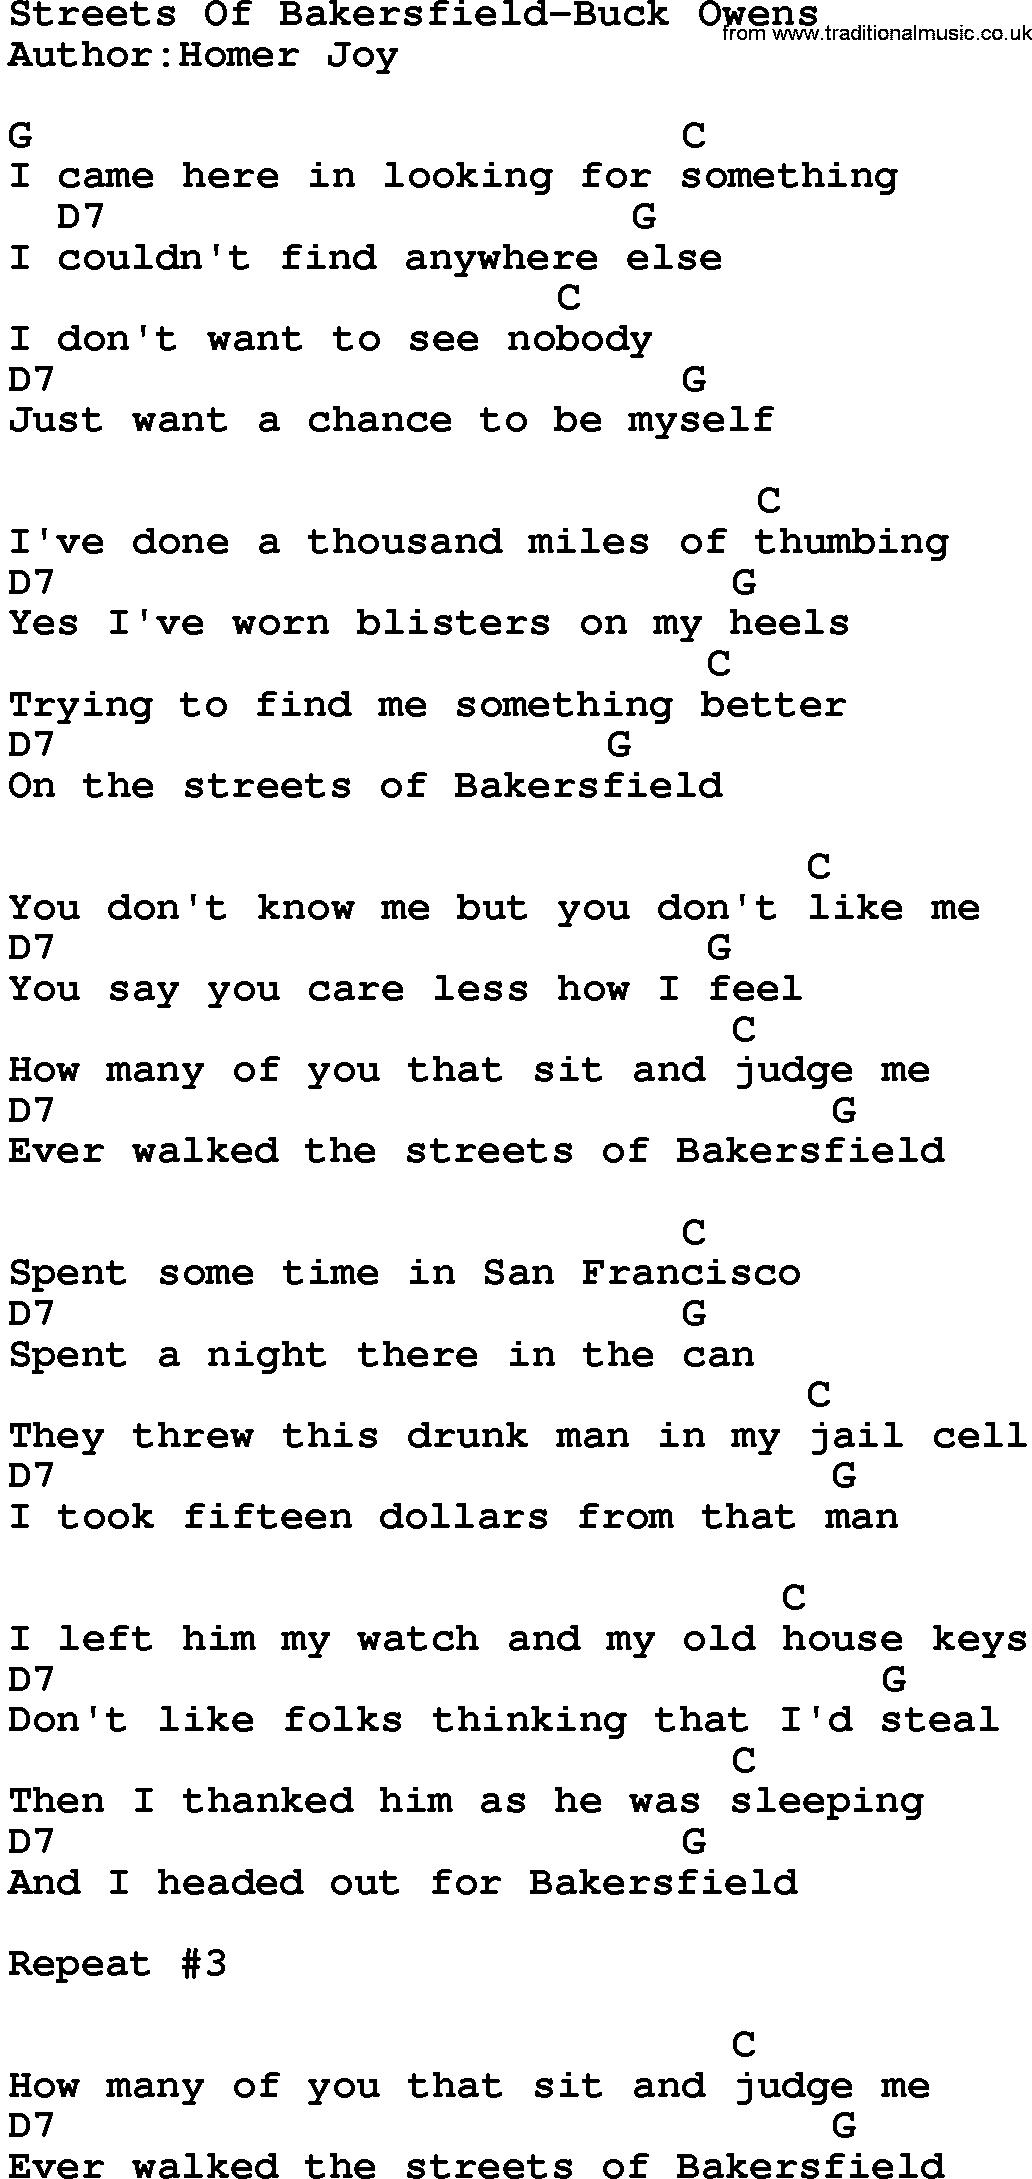 Buck owens song lyrics country music song streets of country musicstreets of bakersfield buck owens lyrics and chords hexwebz Gallery